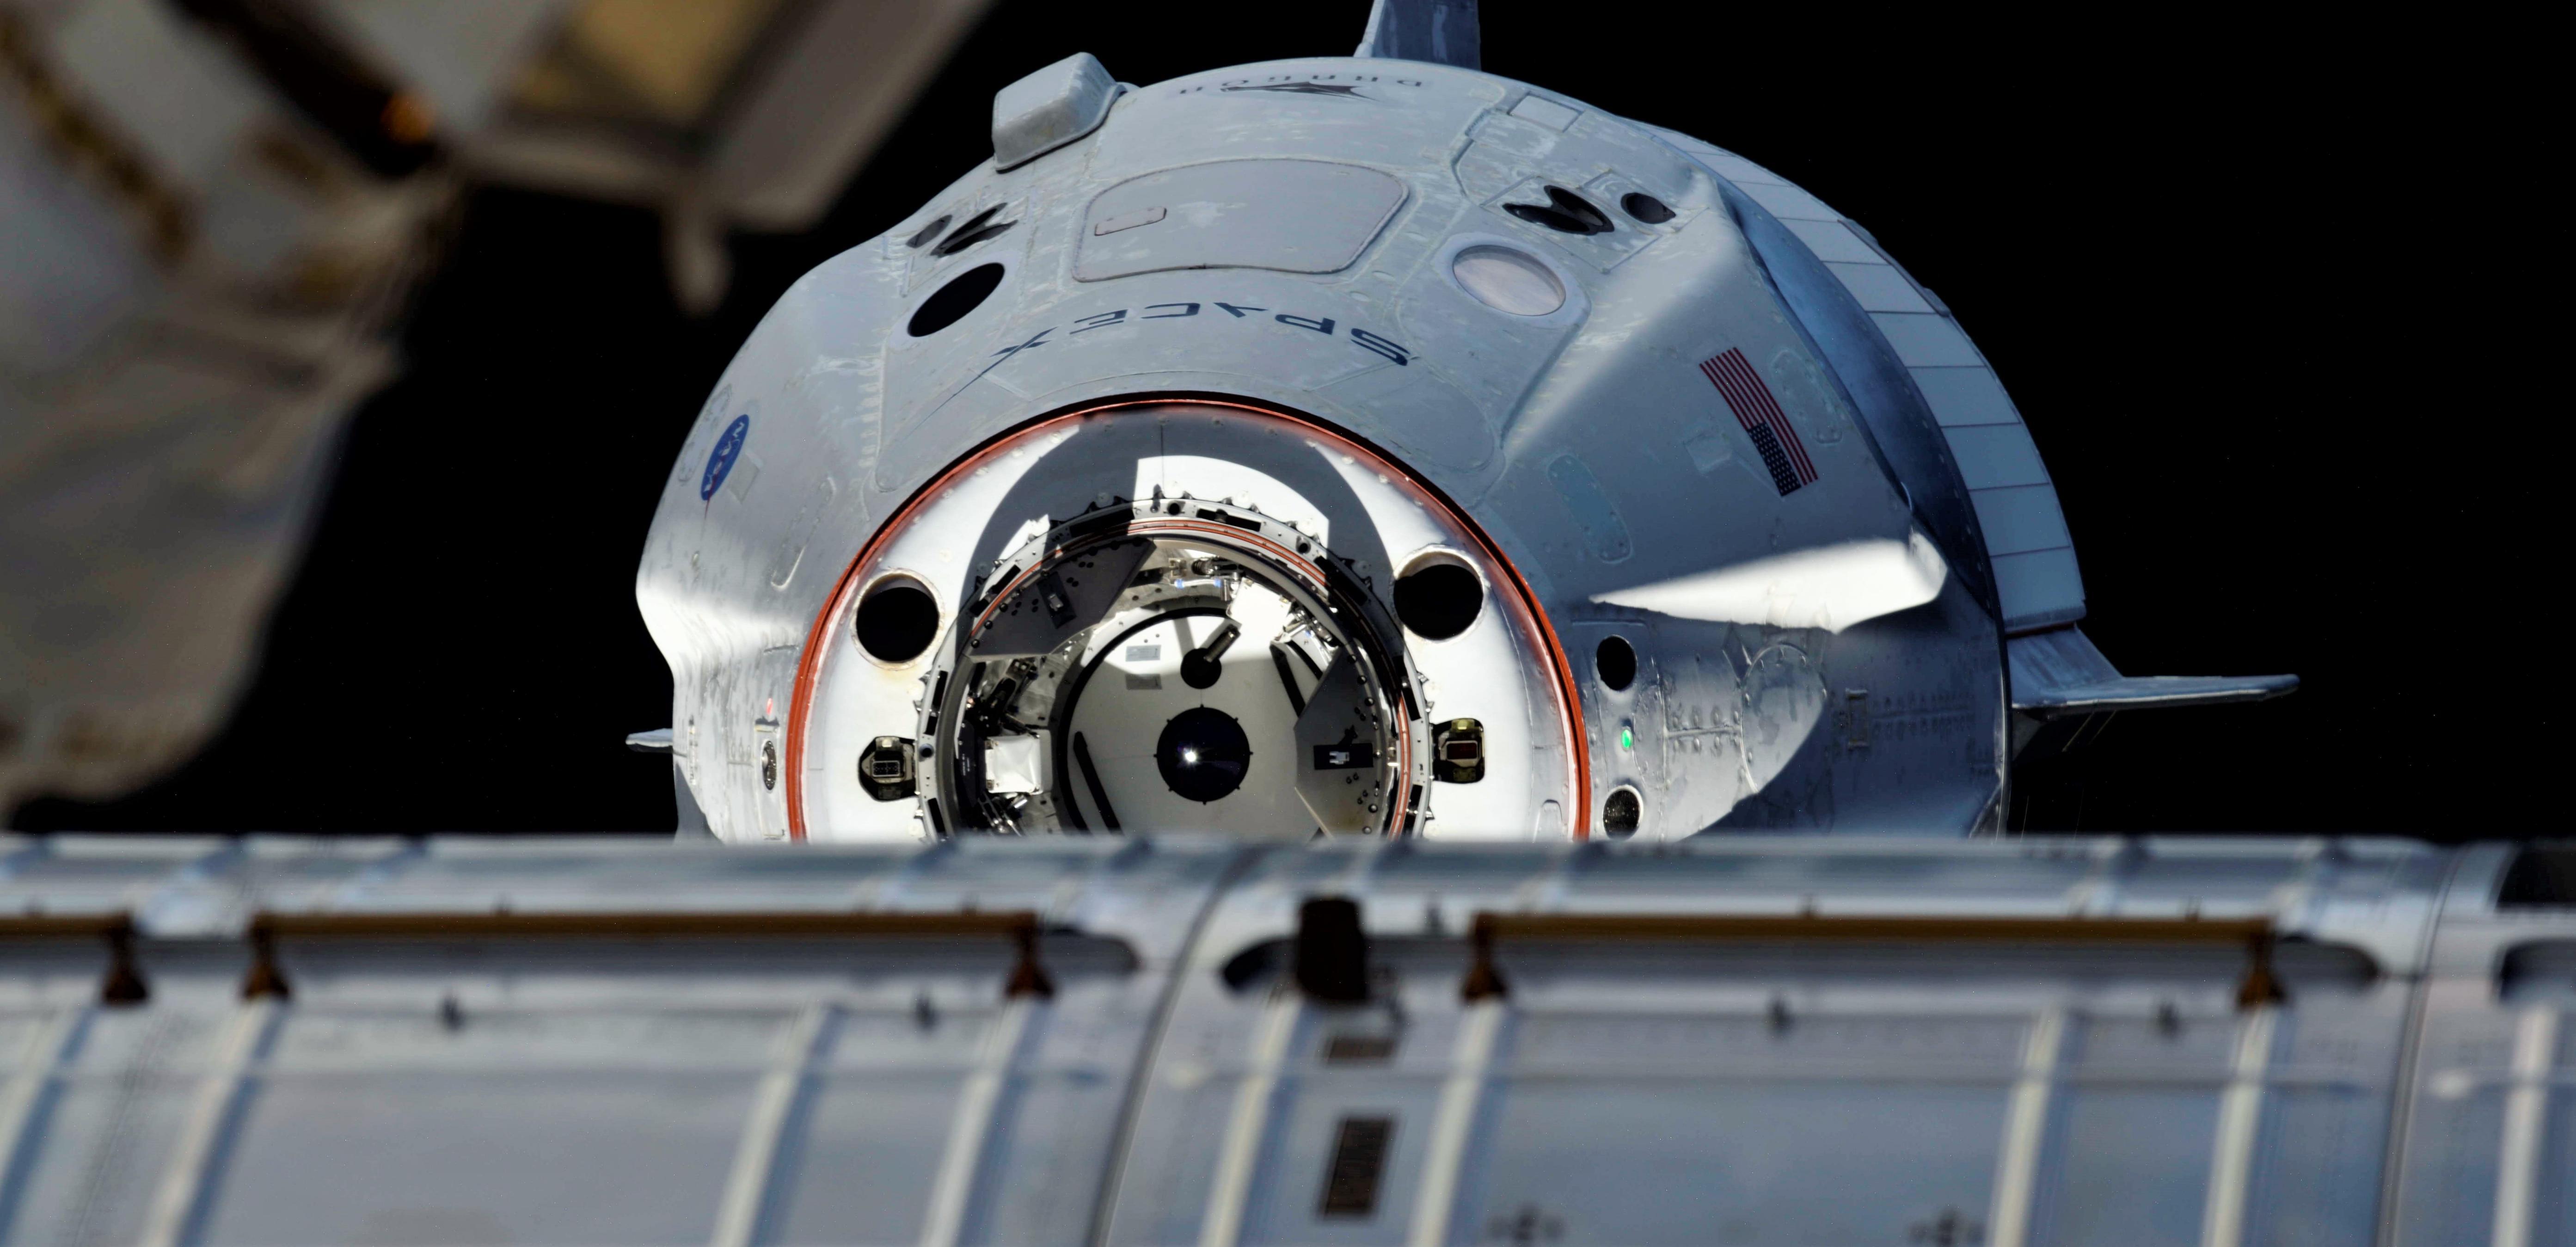 Crew Dragon DM-1 ISS arrival 030319 (Oleg Kononenko) 2 crop (c)